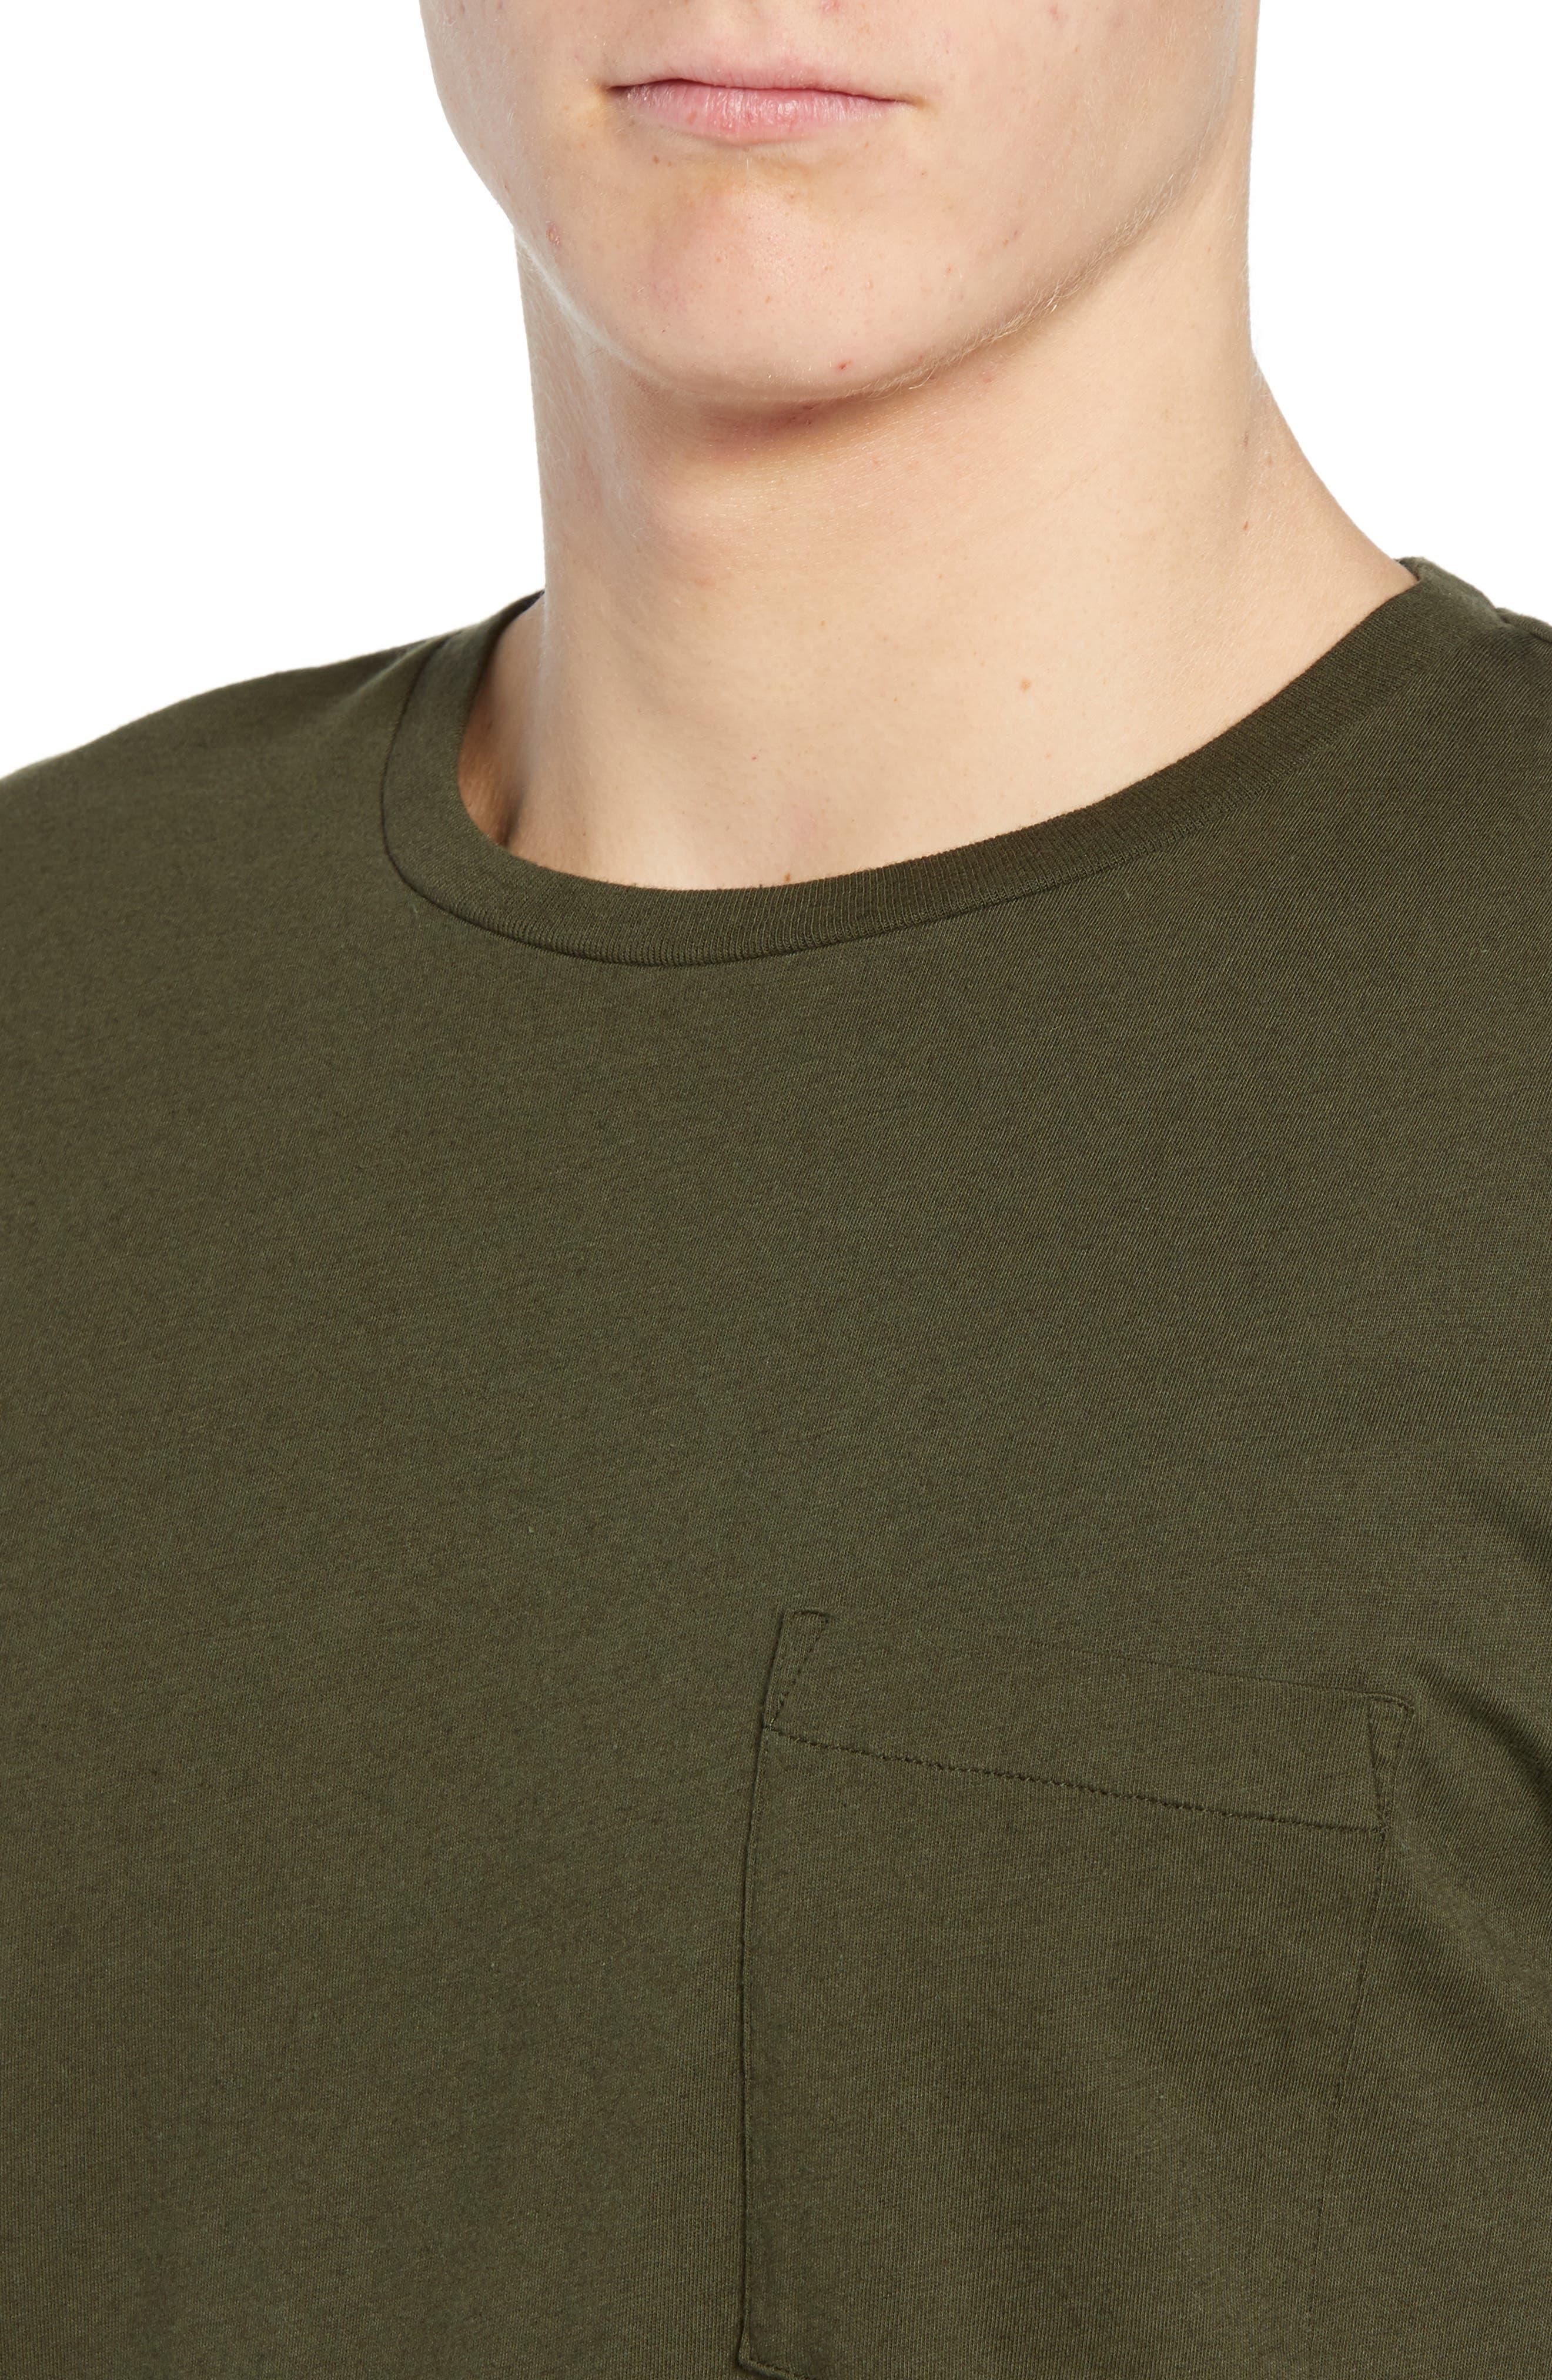 Slim Fit Pocket T-Shirt,                             Alternate thumbnail 4, color,                             300